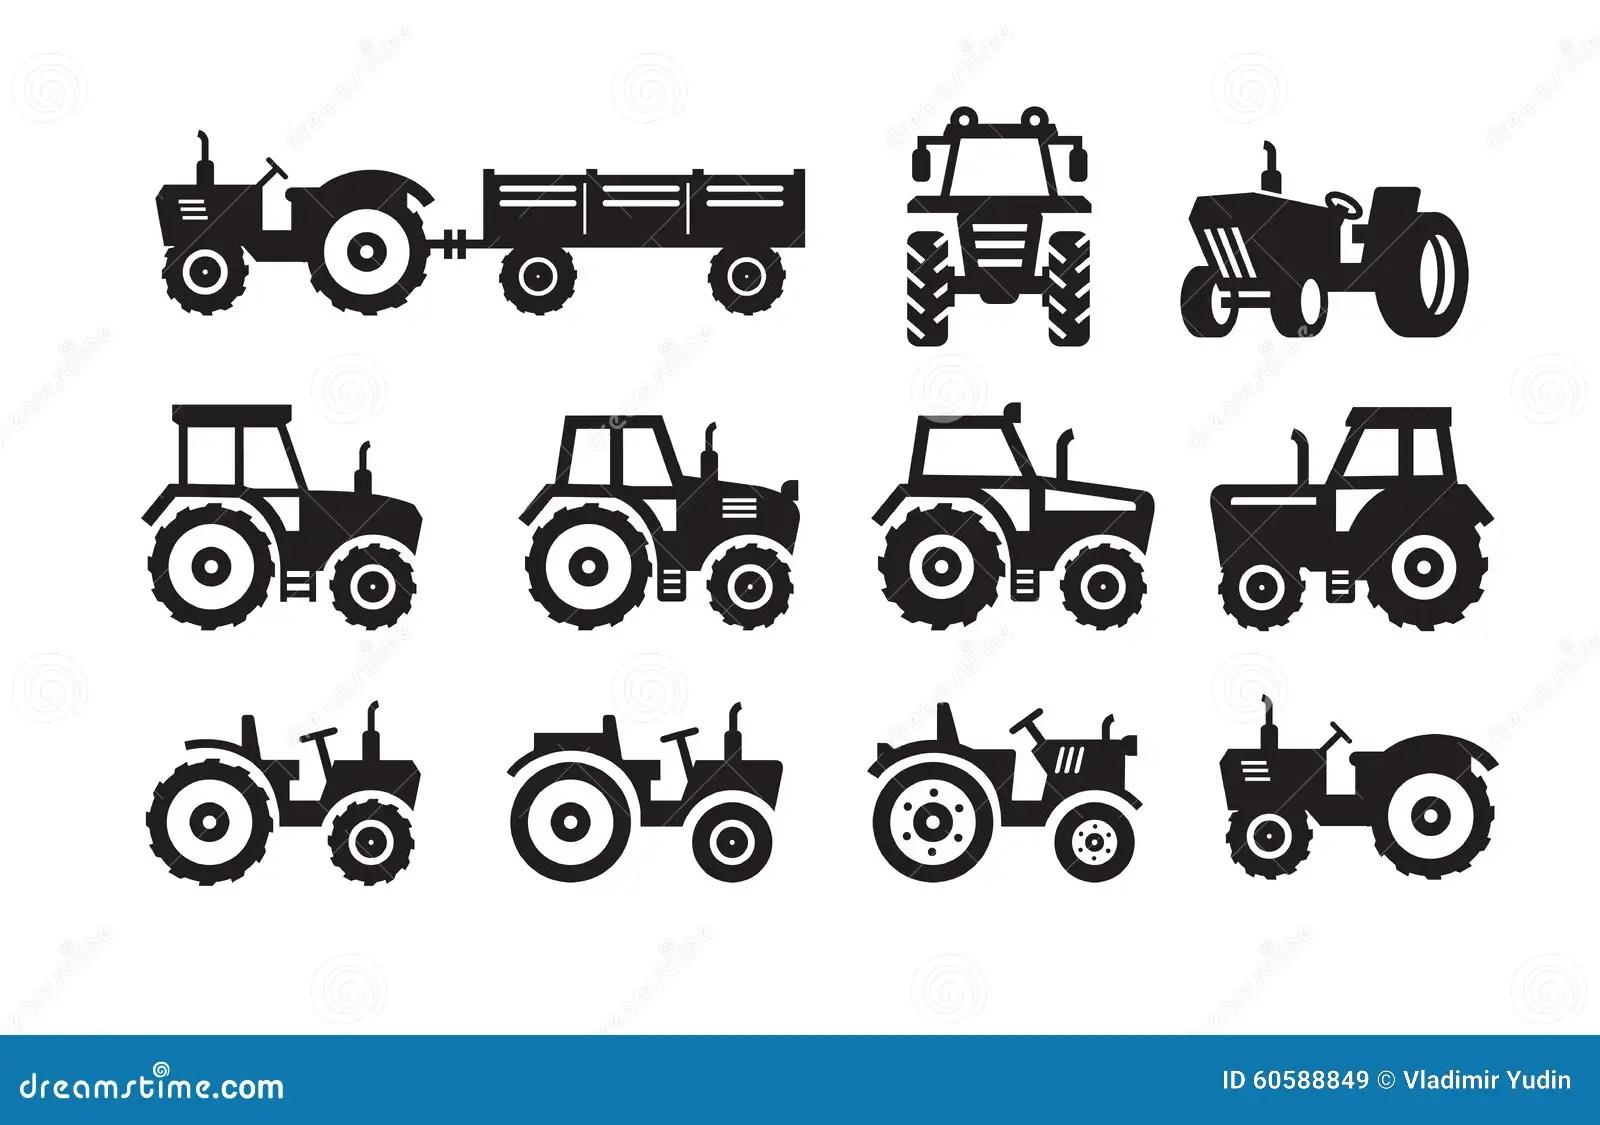 Tractor Icon In Comics Style Cartoon Vector